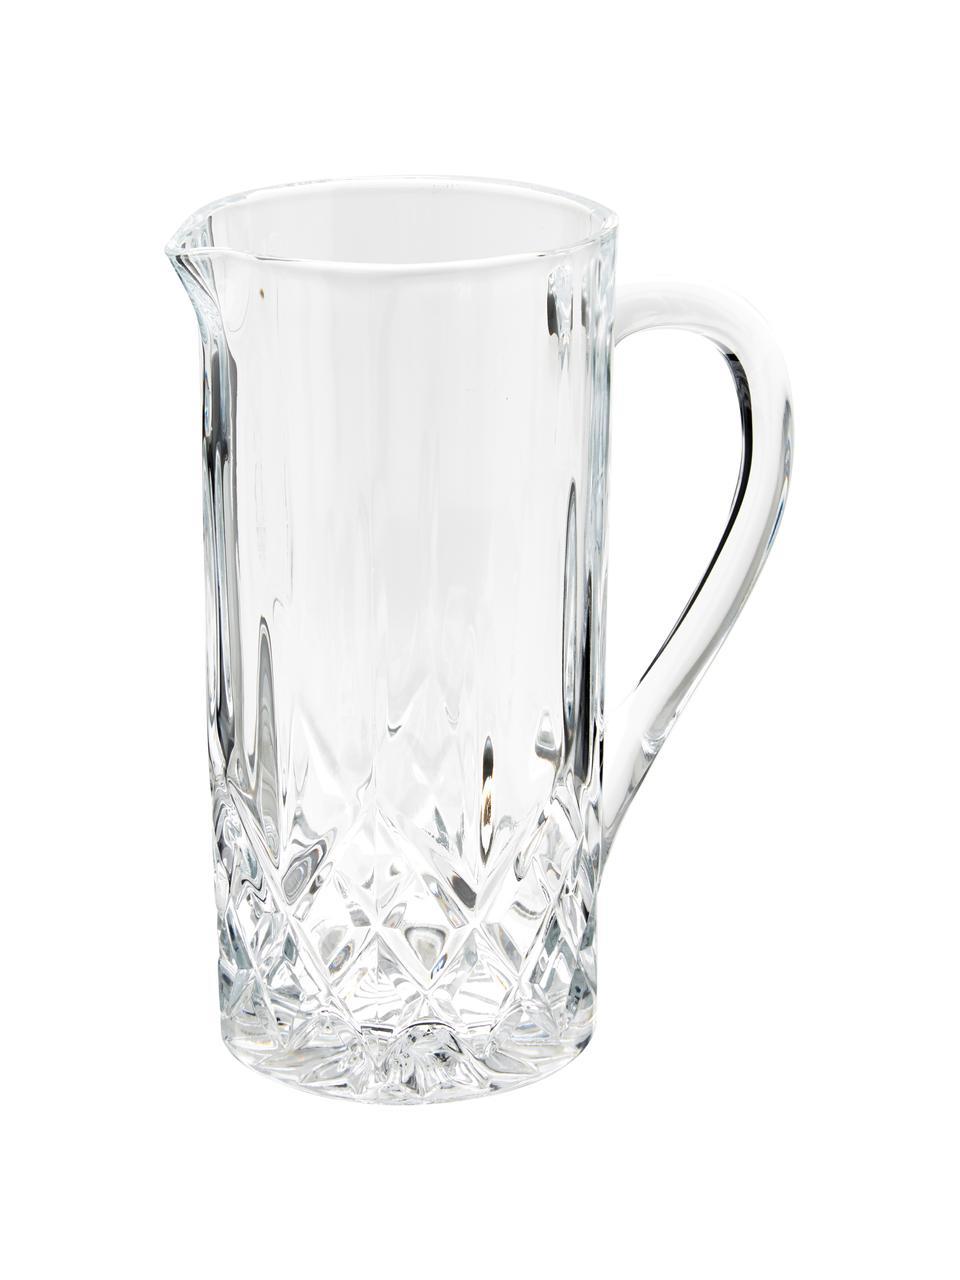 Kristall-Krug Opera mit Relief, 1.2 L, Luxion-Kristallglas, Transparent, H 23 cm